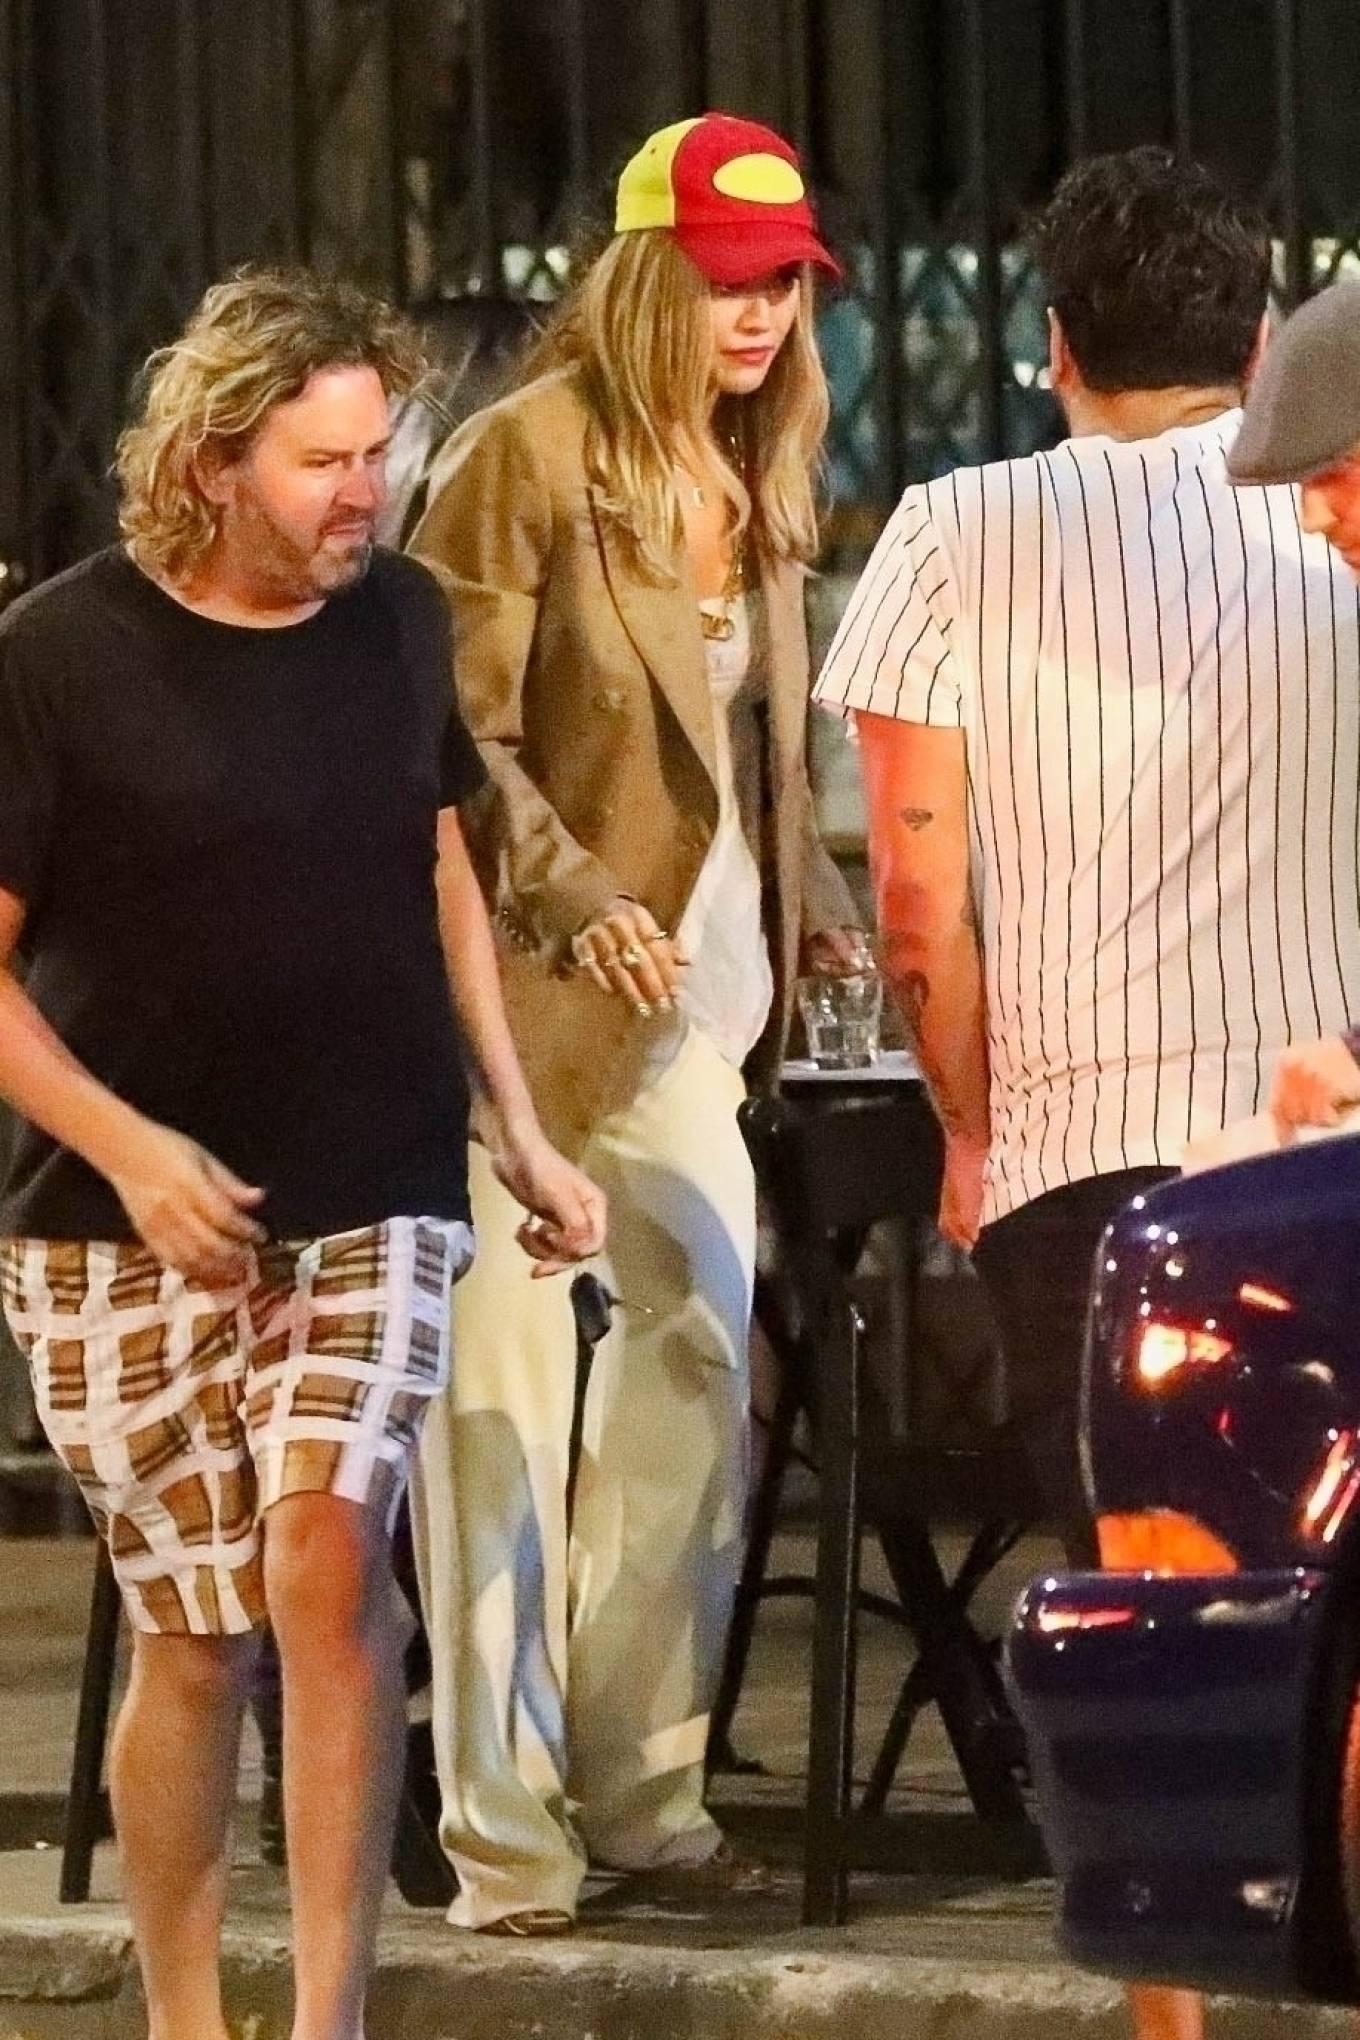 Rita Ora - With boyfriend Taika Waititi out in Los Angeles